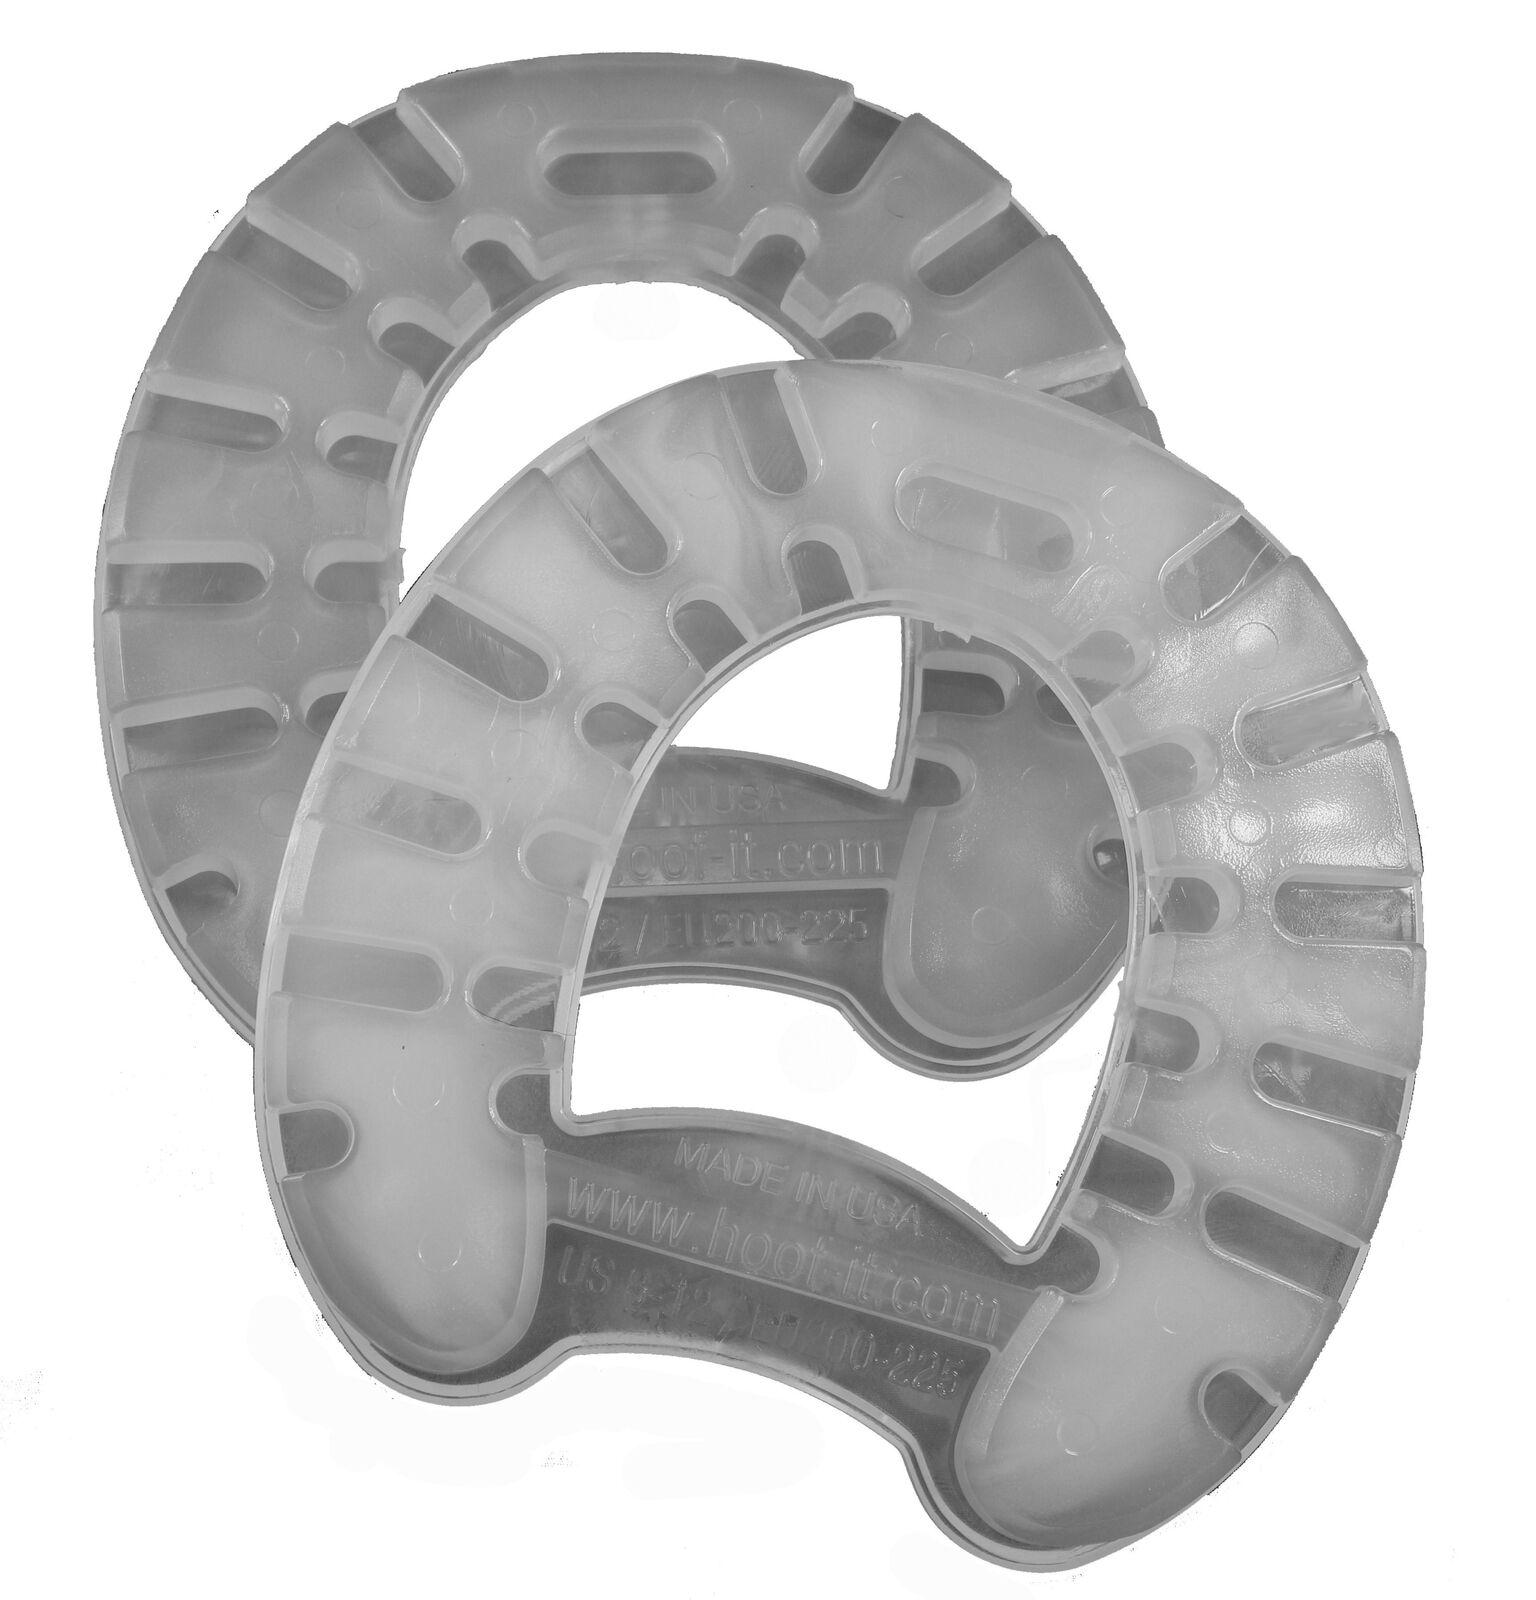 Plastic Horseshoes Size US 8-12 - HOOF-it  Natural Flex Horseshoes